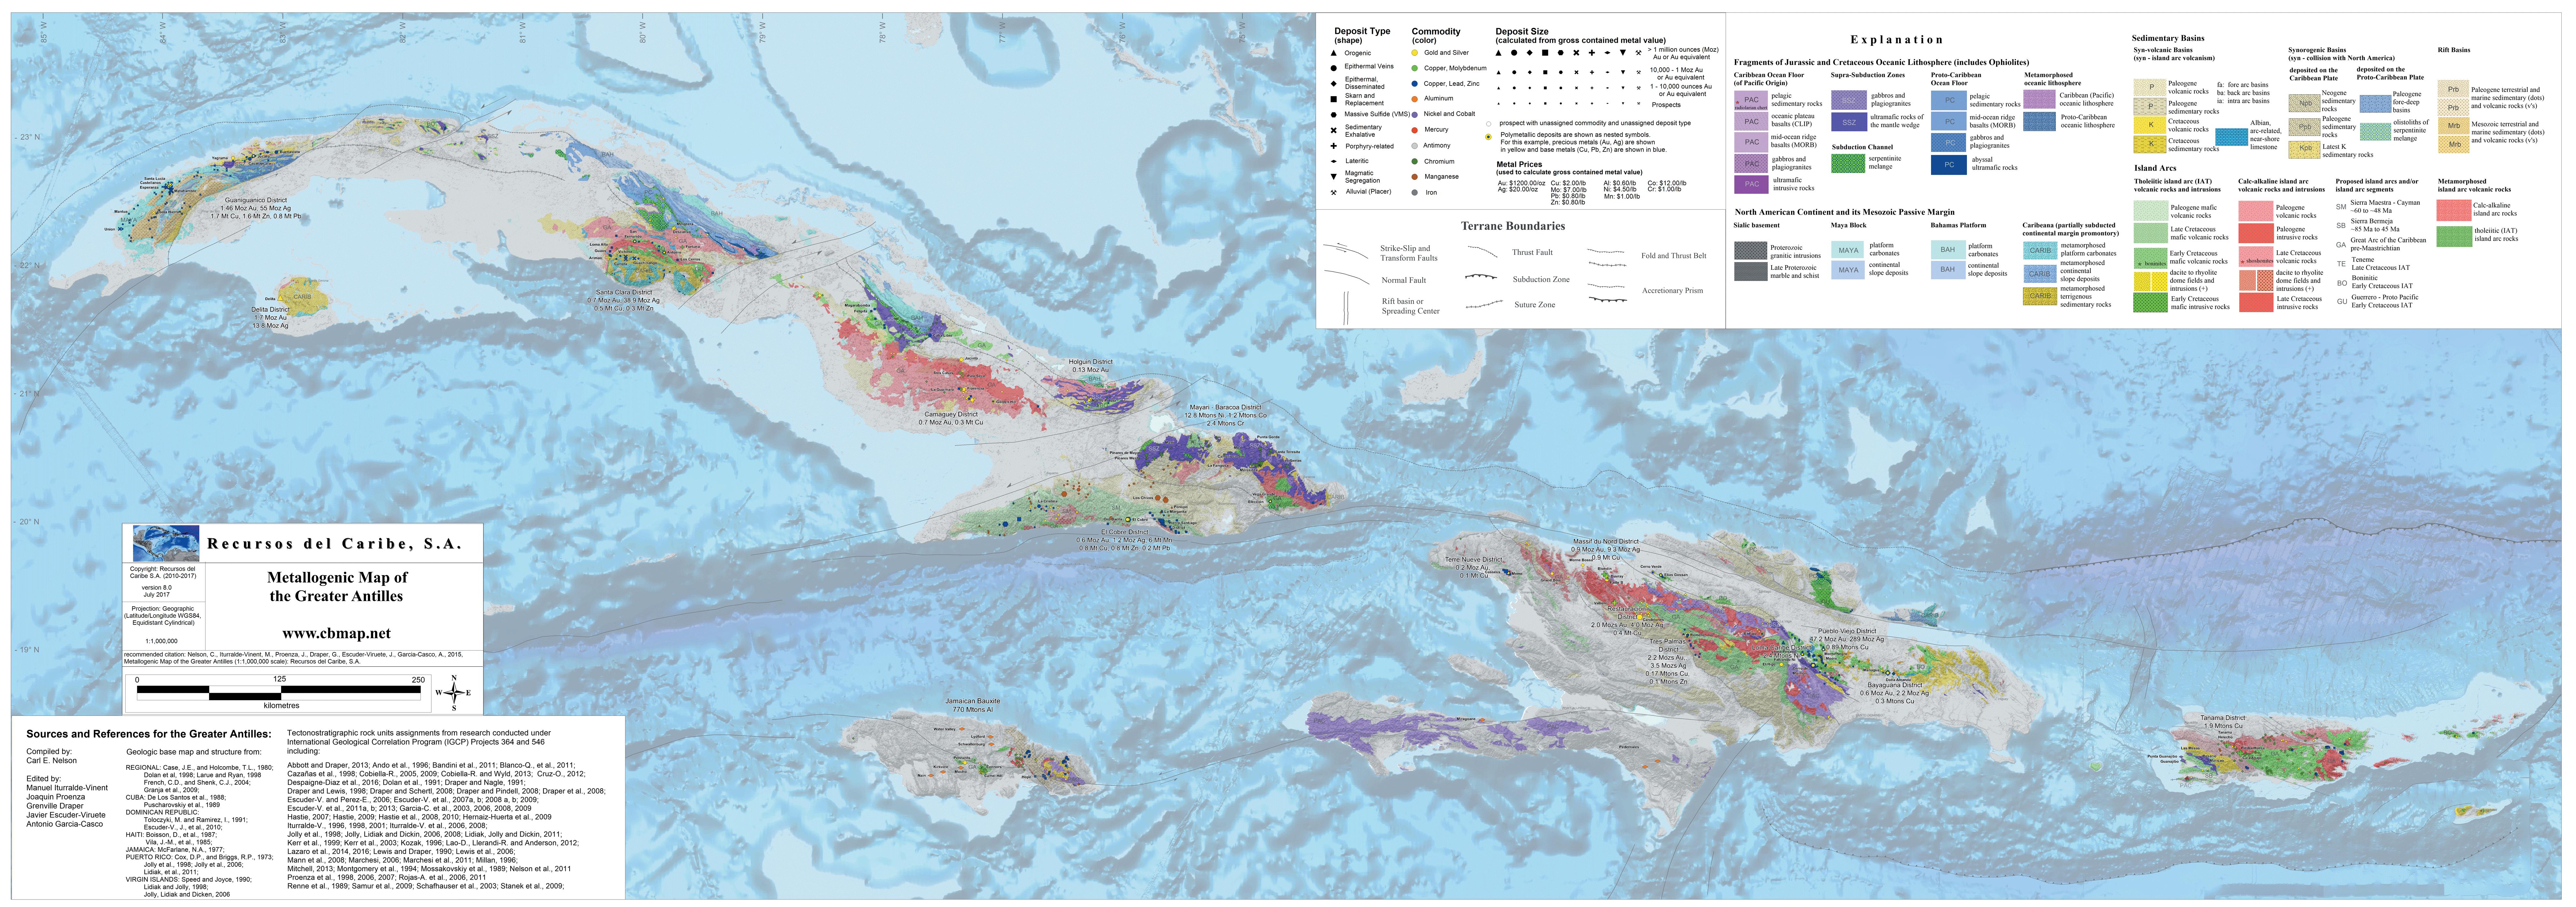 Topographic Map Of Haiti.Greater Antilles Recursos Del Caribe S A